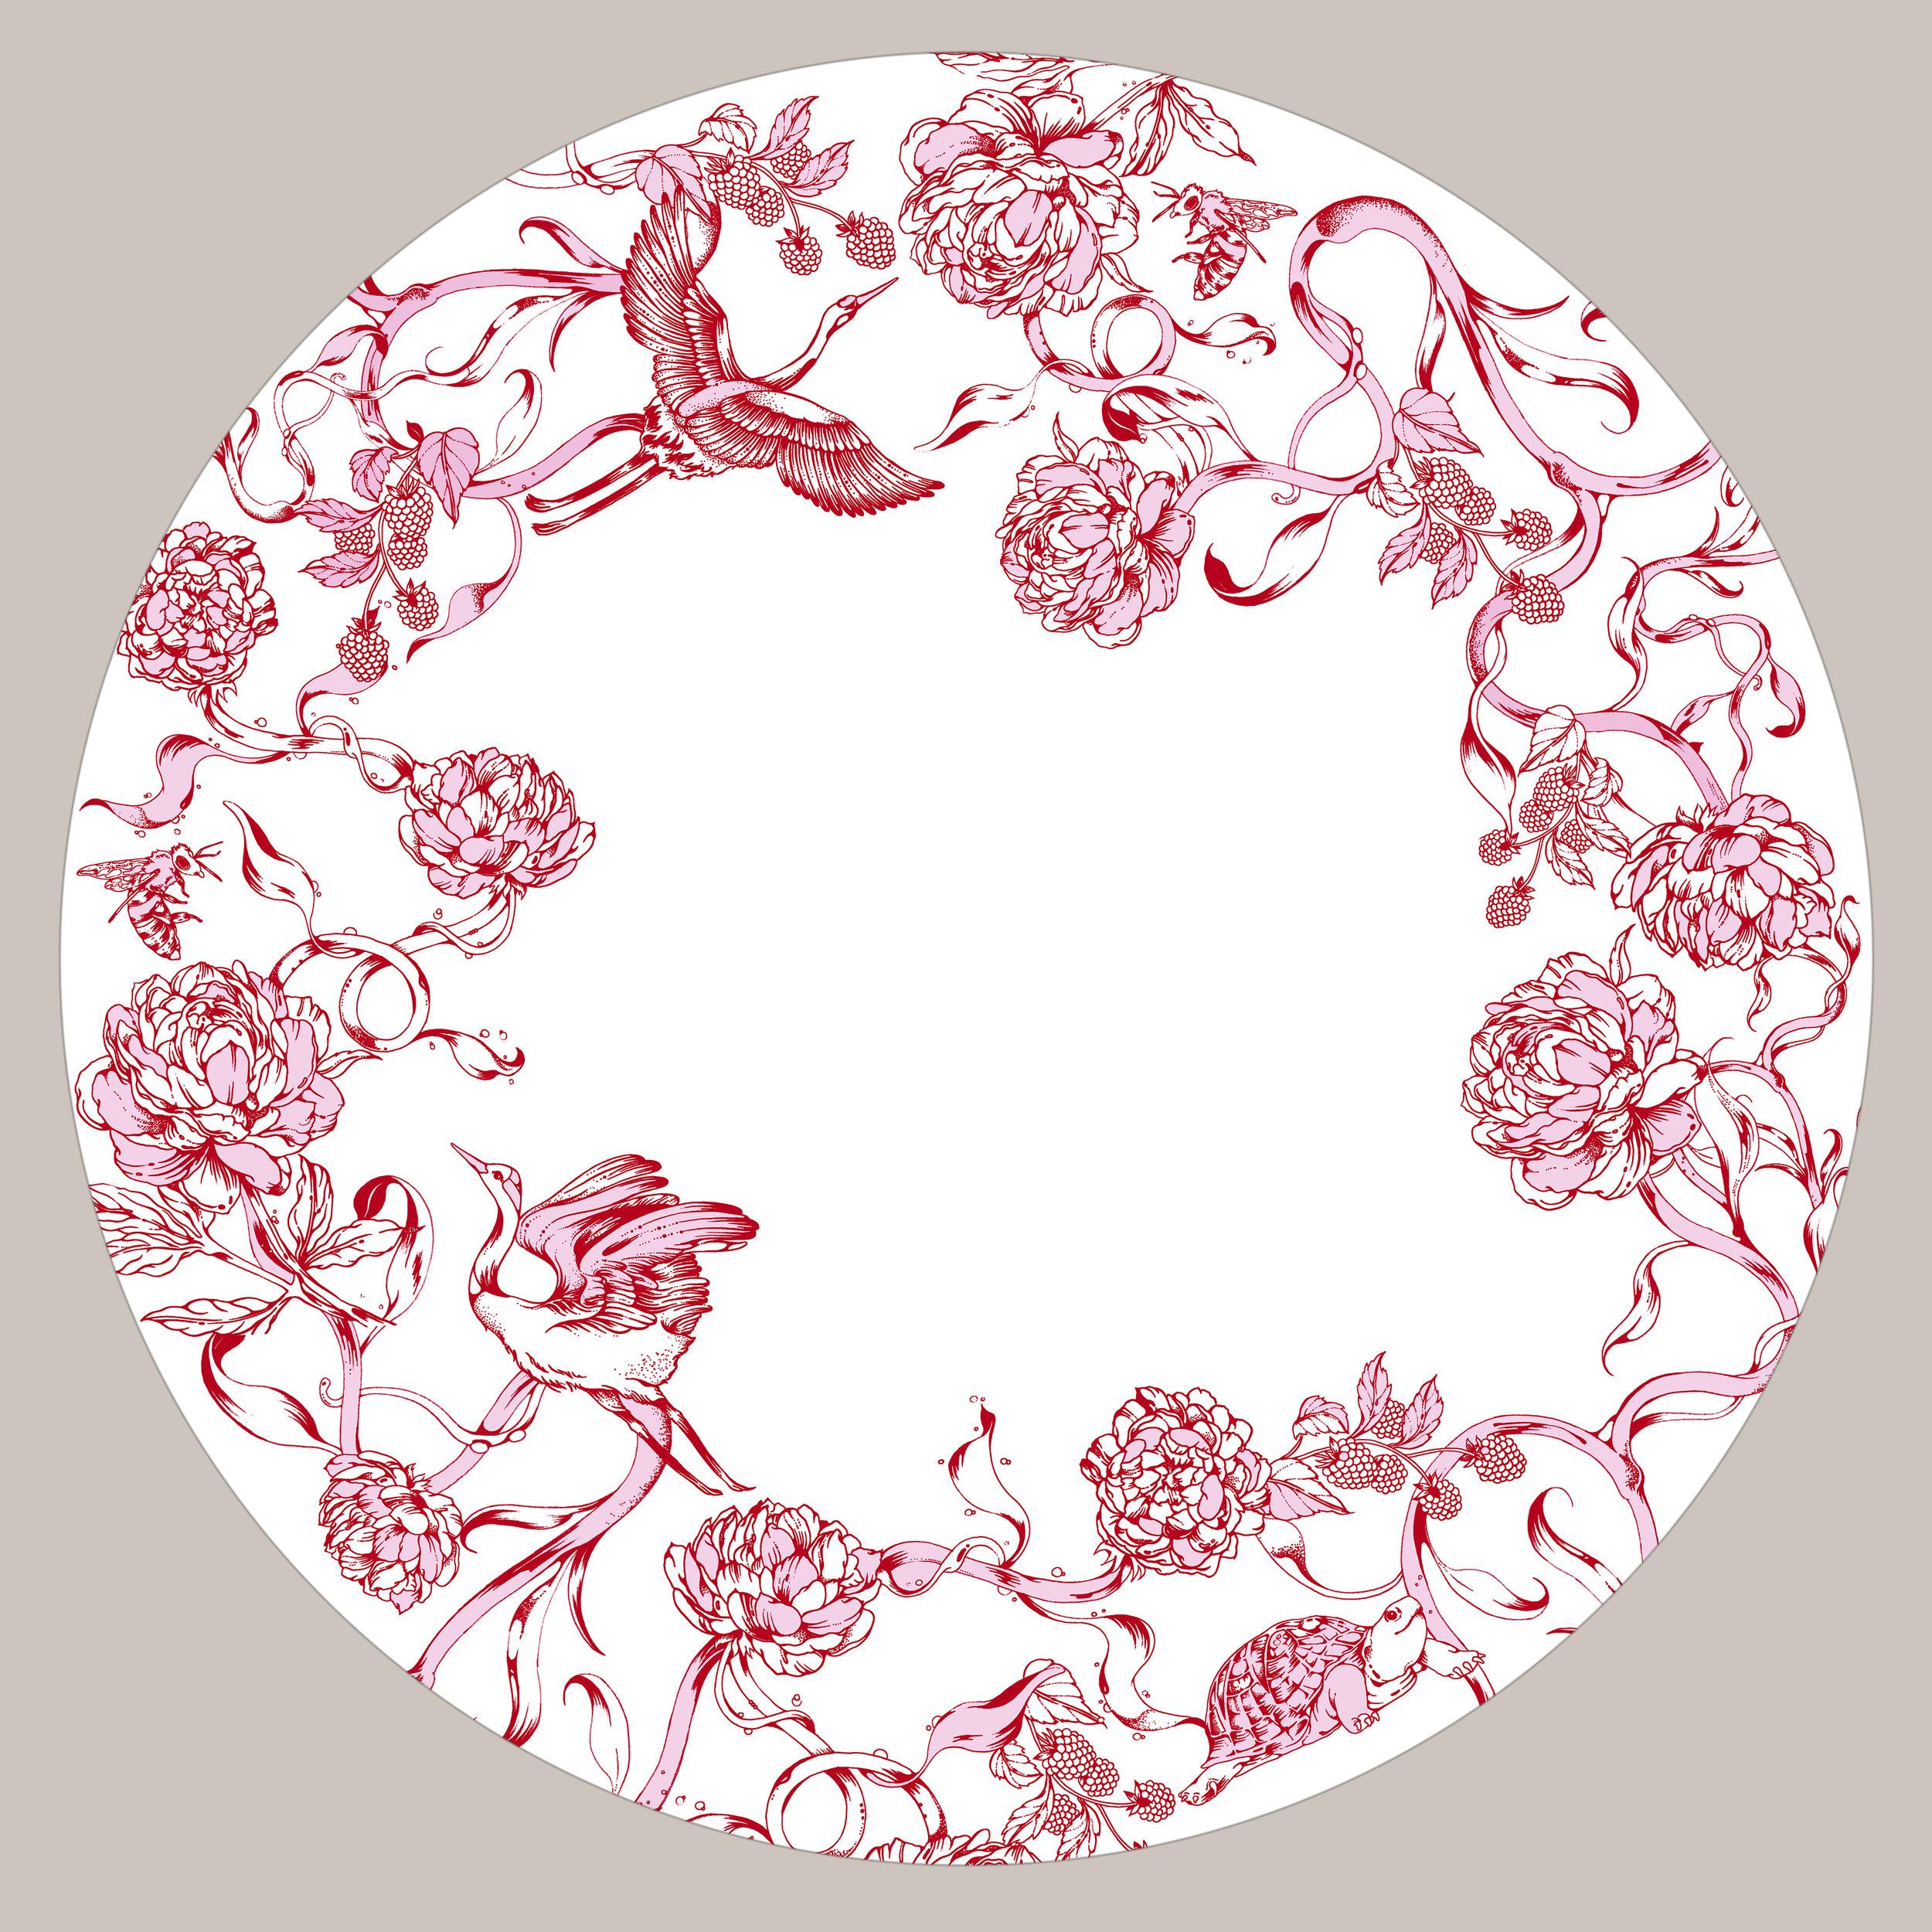 Artwork_Plate_CIMB_Colour_For Print_Lowres.jpg